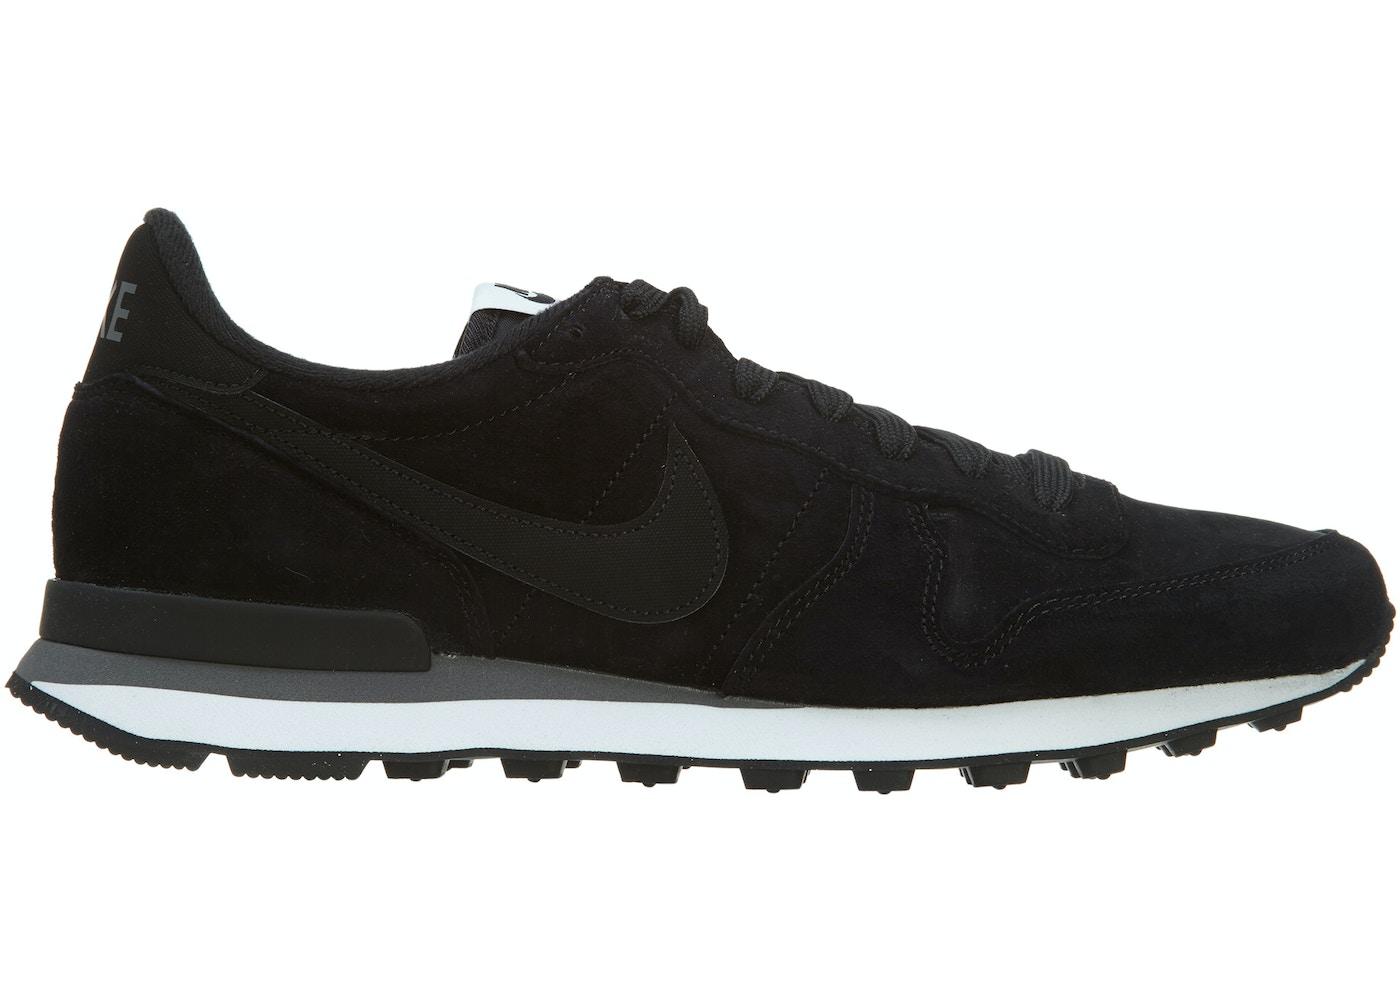 Charles Keasing blanco como la nieve Derecho  Nike Internationalist Leather Black Black-Dark Grey-White - 631755-010